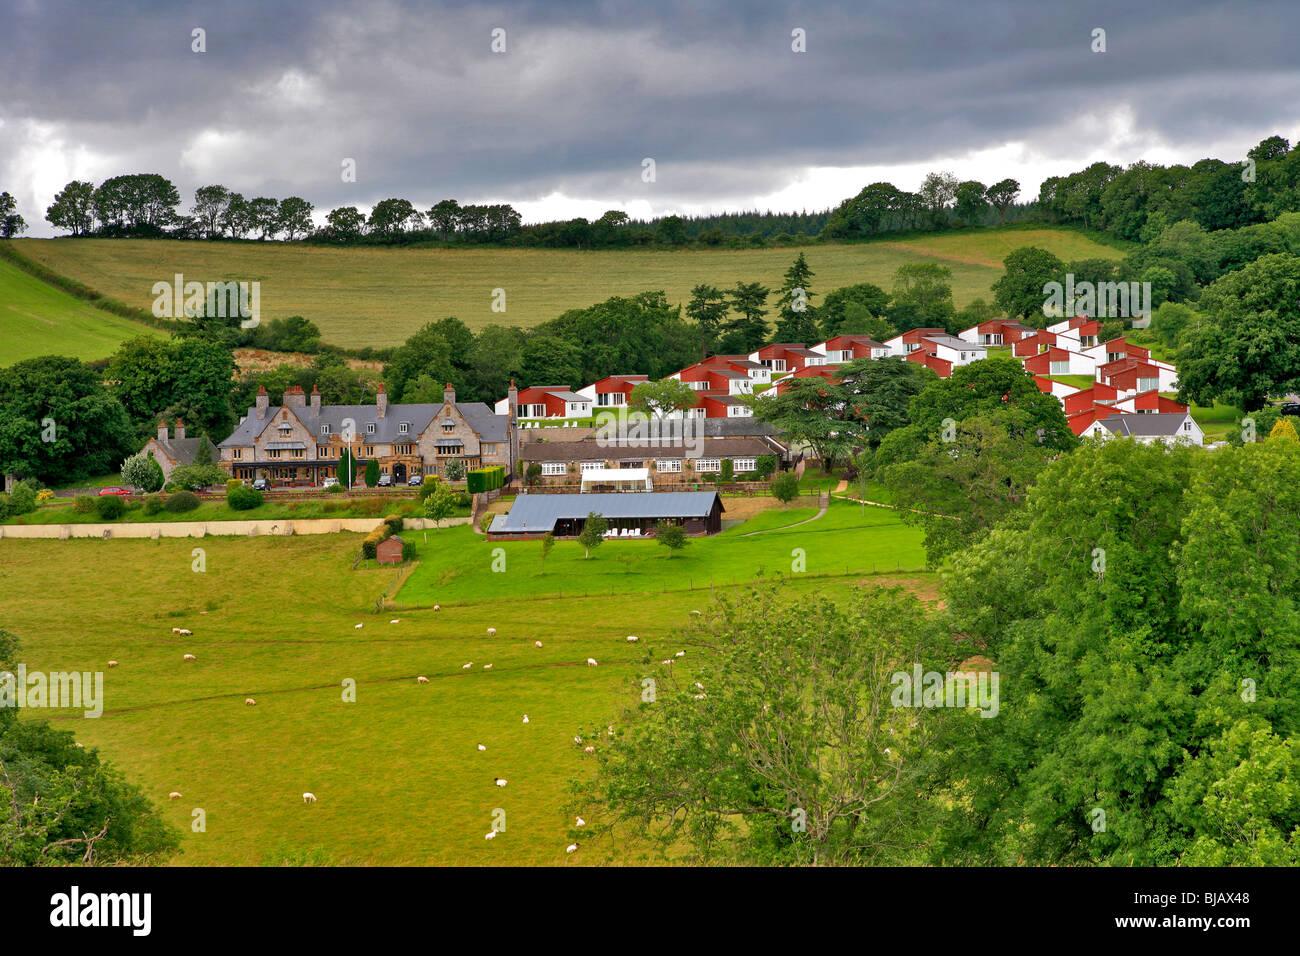 Harcombe House Chudleigh Village Devon England Uk Stock